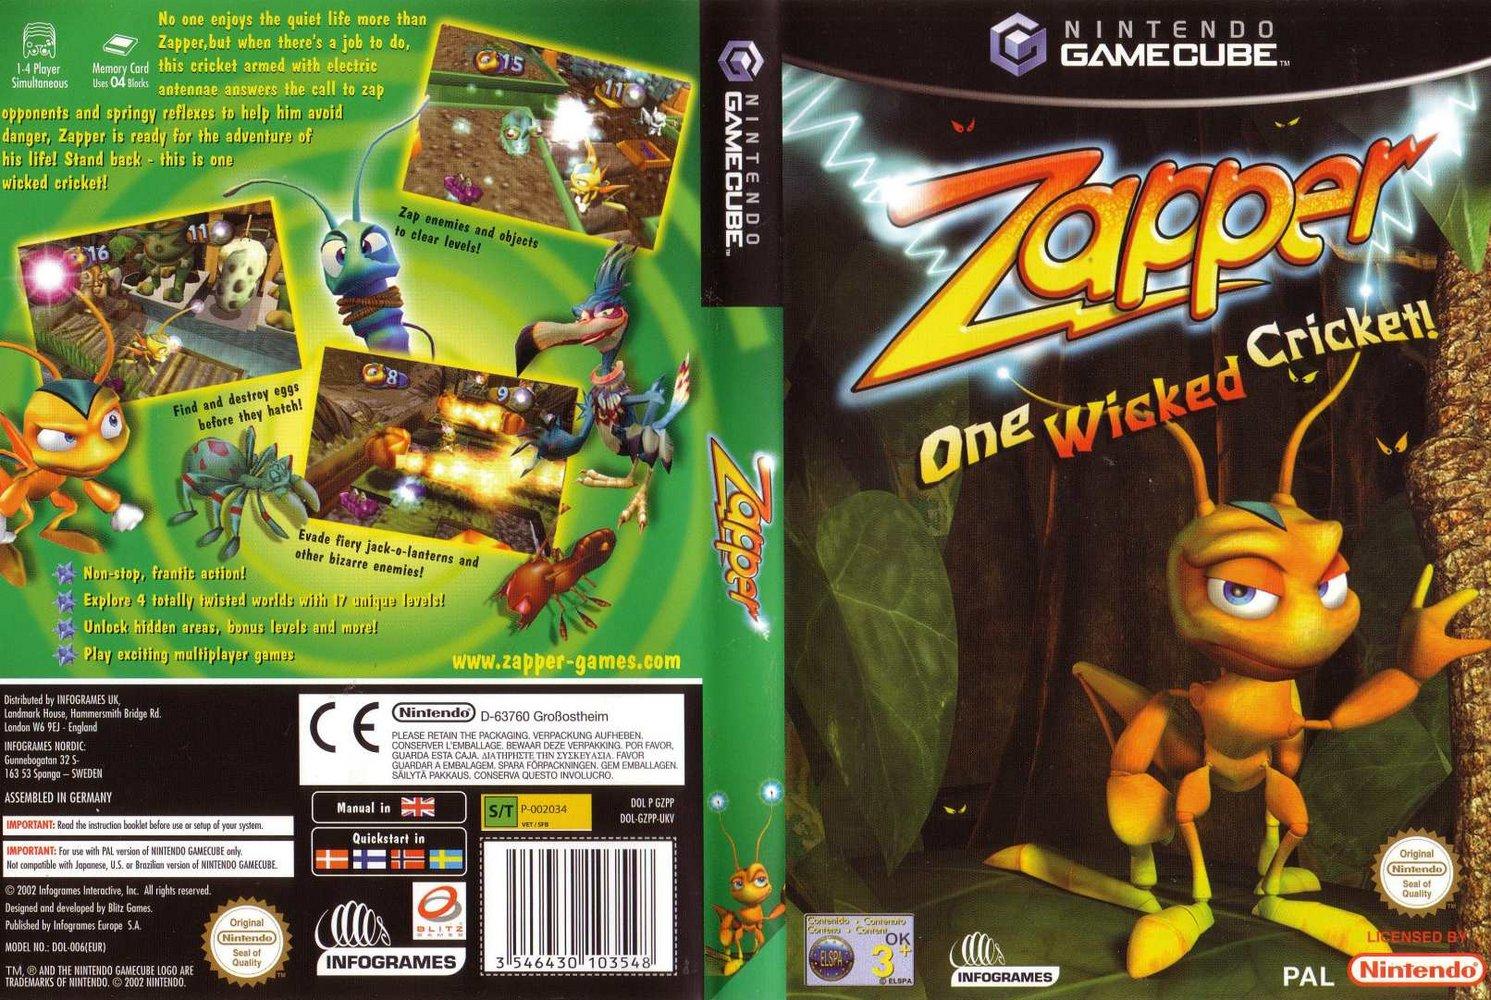 Zapper One Wicked Cricket Iso